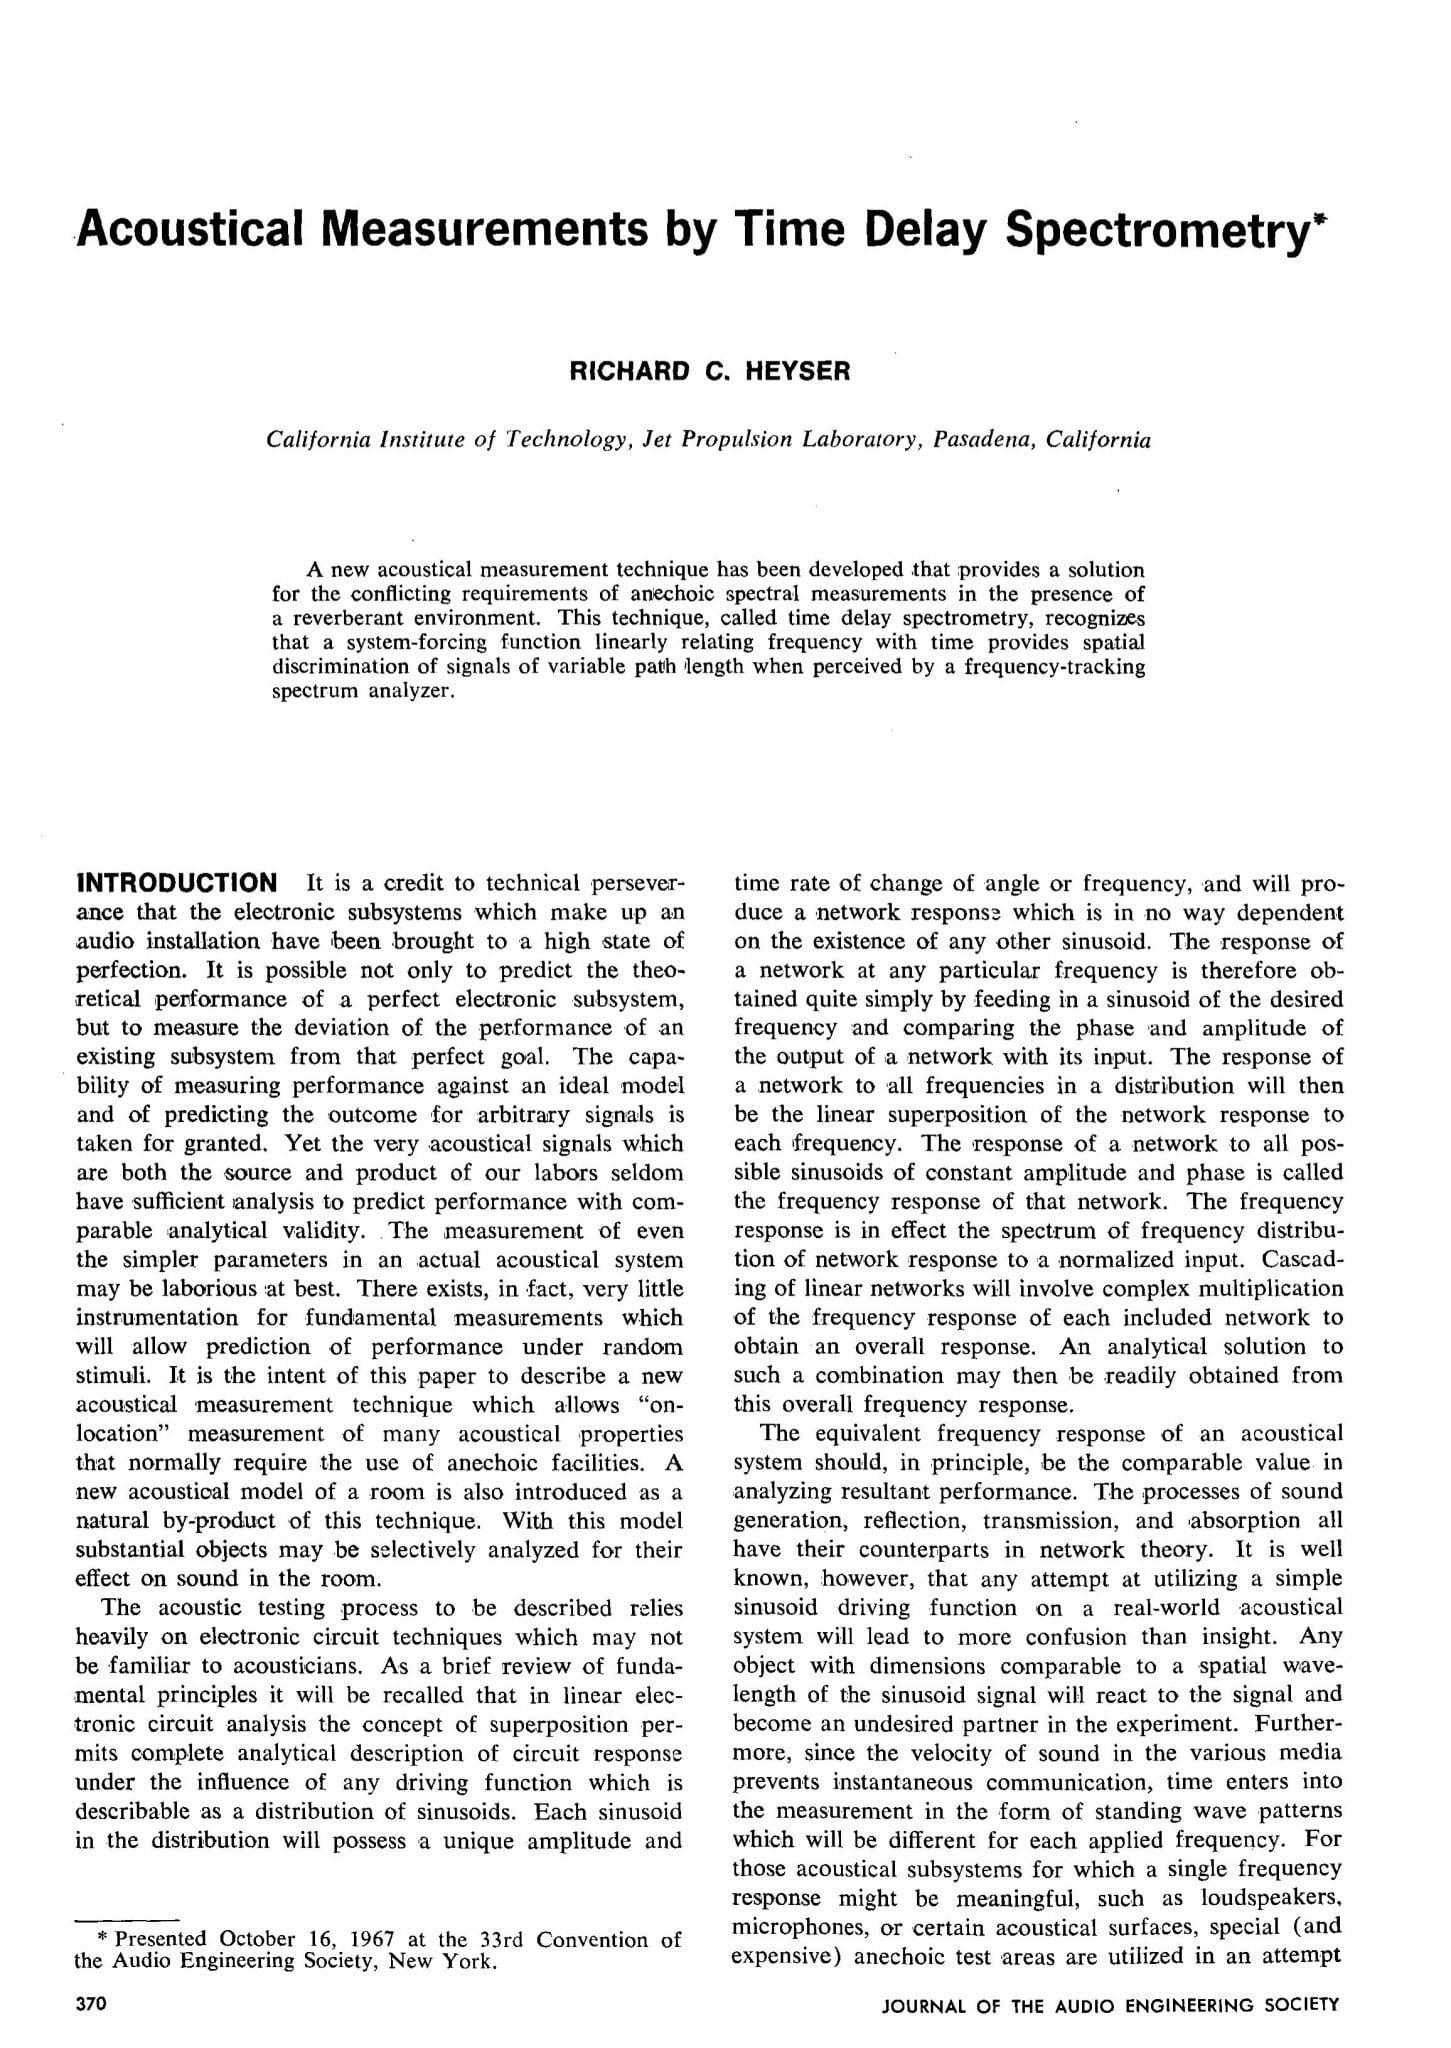 Verification Worksheet Independent University Of Phoenix Throughout Verification Worksheet Independent University Of Phoenix